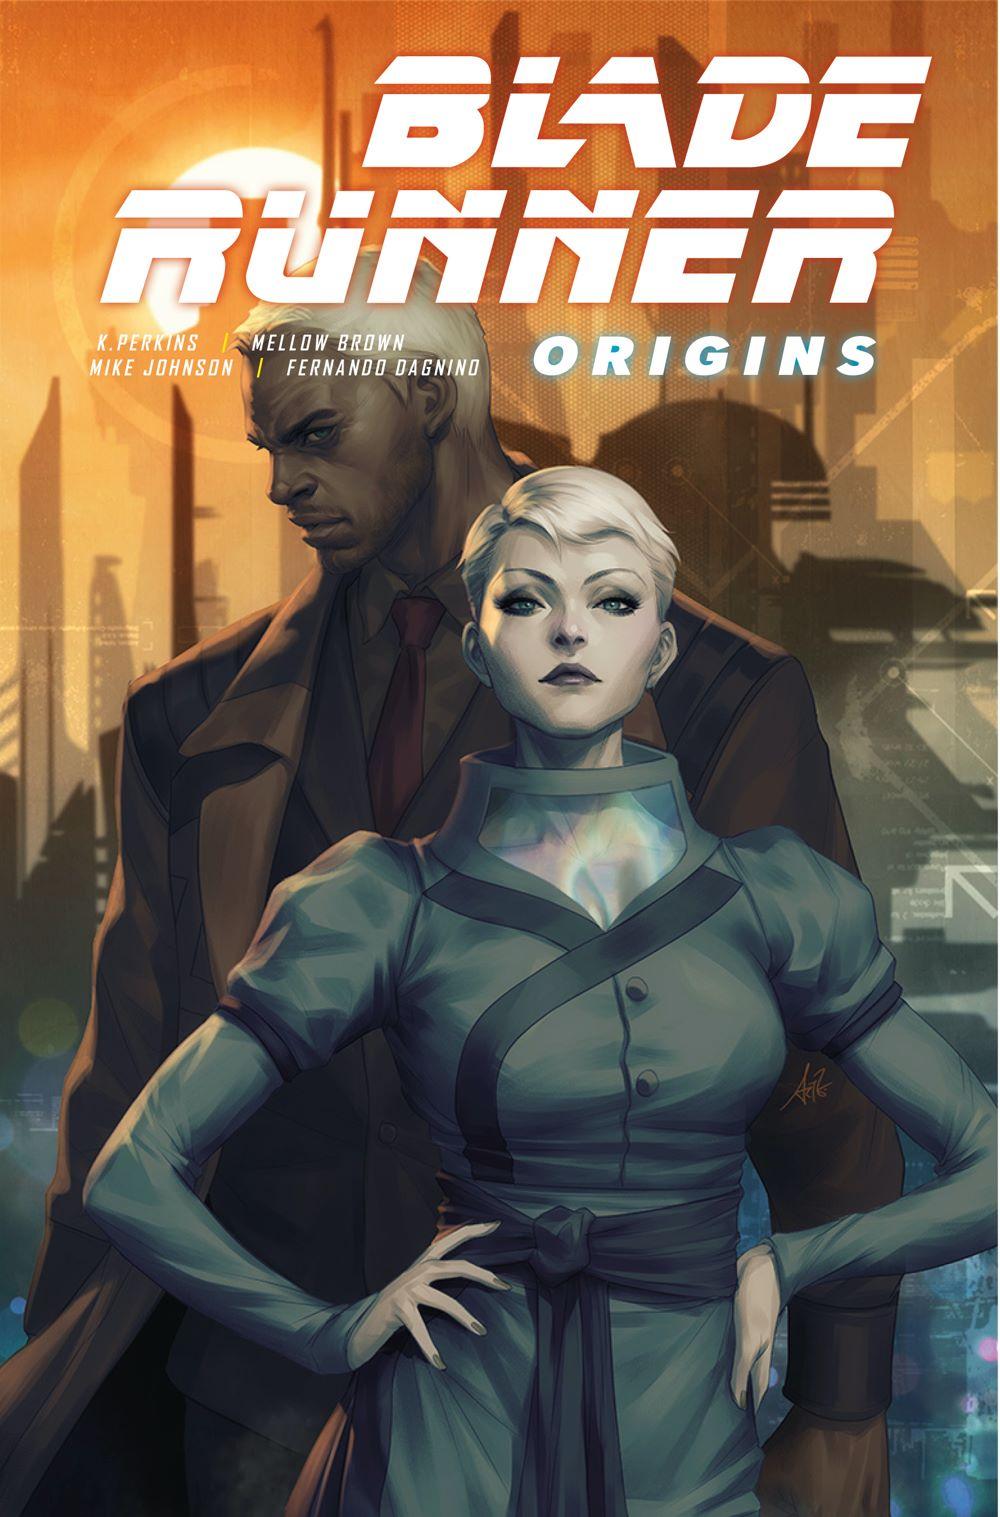 Blade-Runner-Origins_1_A_ARTGERM ComicList: Titan Comics New Releases for 03/10/2021